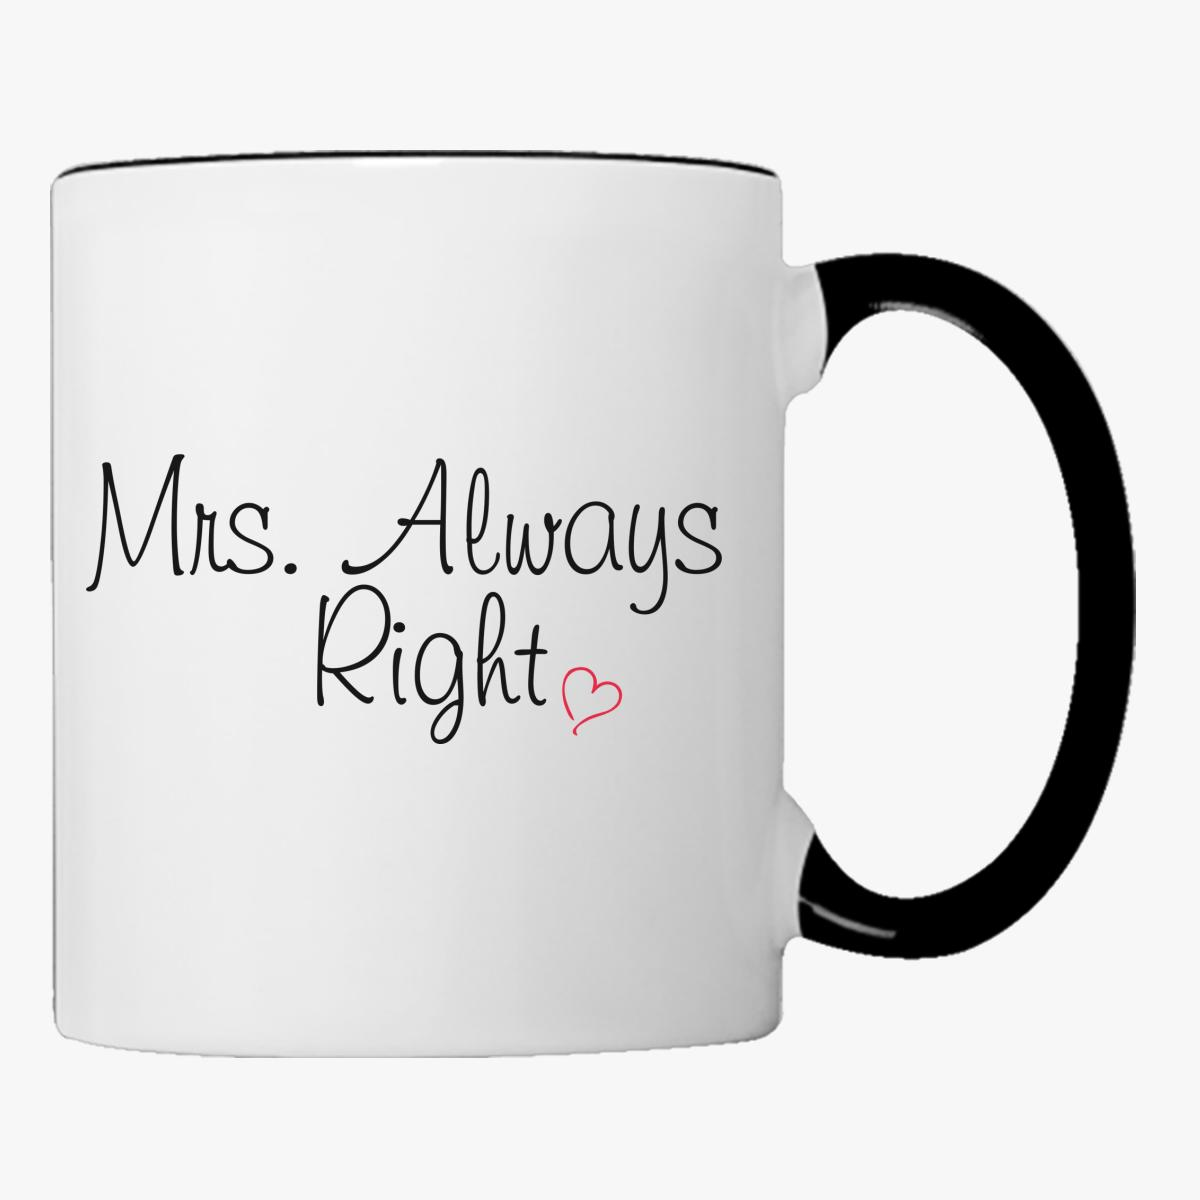 Buy MRS. ALWAYS RIGHT Coffee Mug, 407395